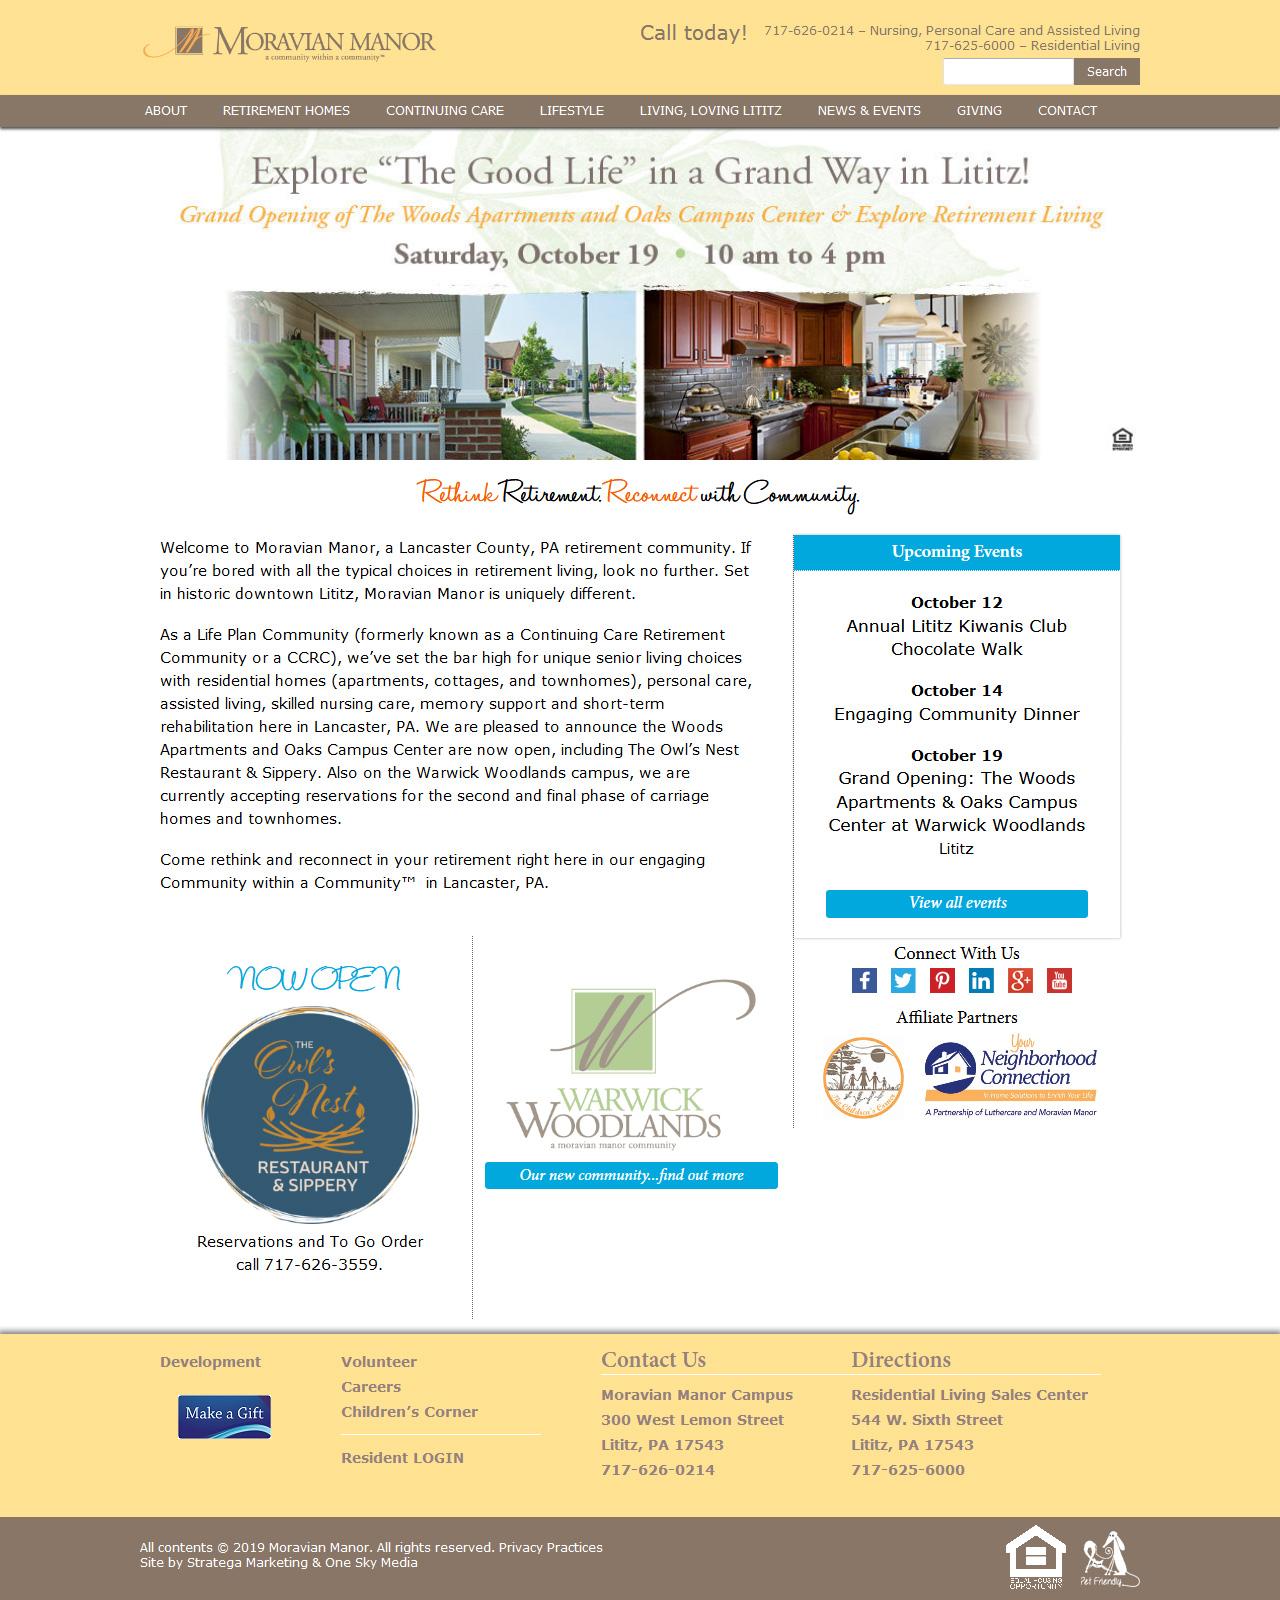 Moravian Manor Nursing Home website design